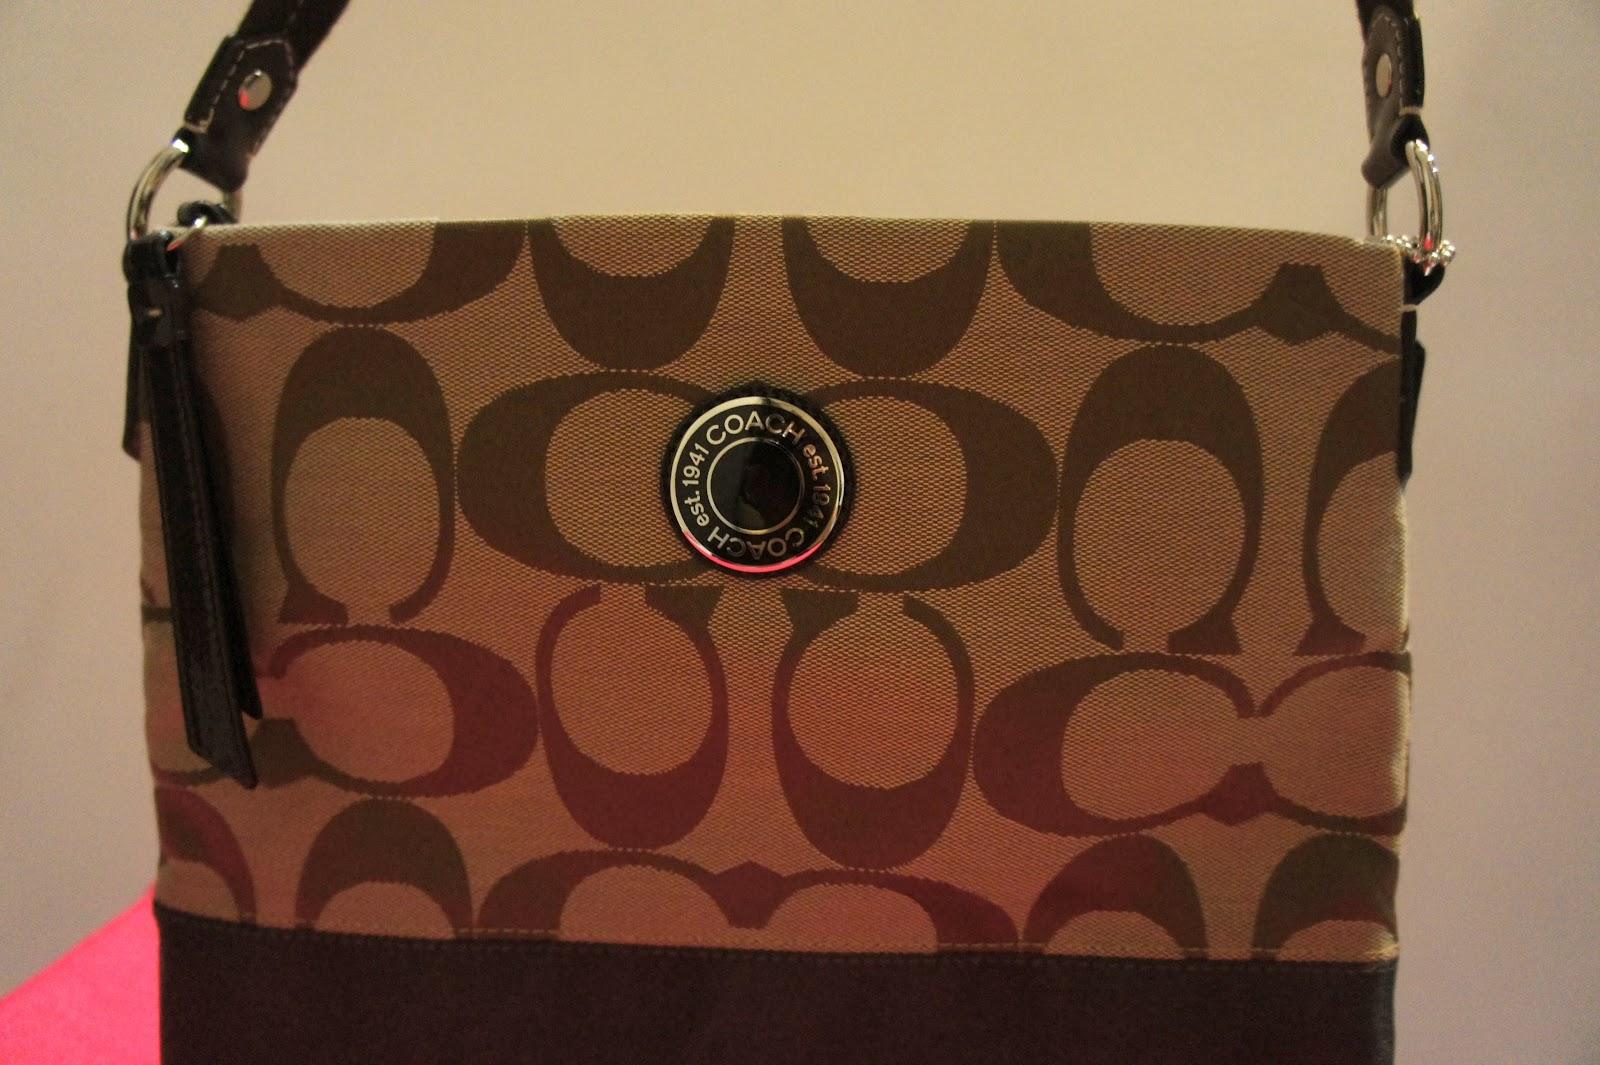 Queen's closet: Coach sling bag @ $240 - brown (SOLD)